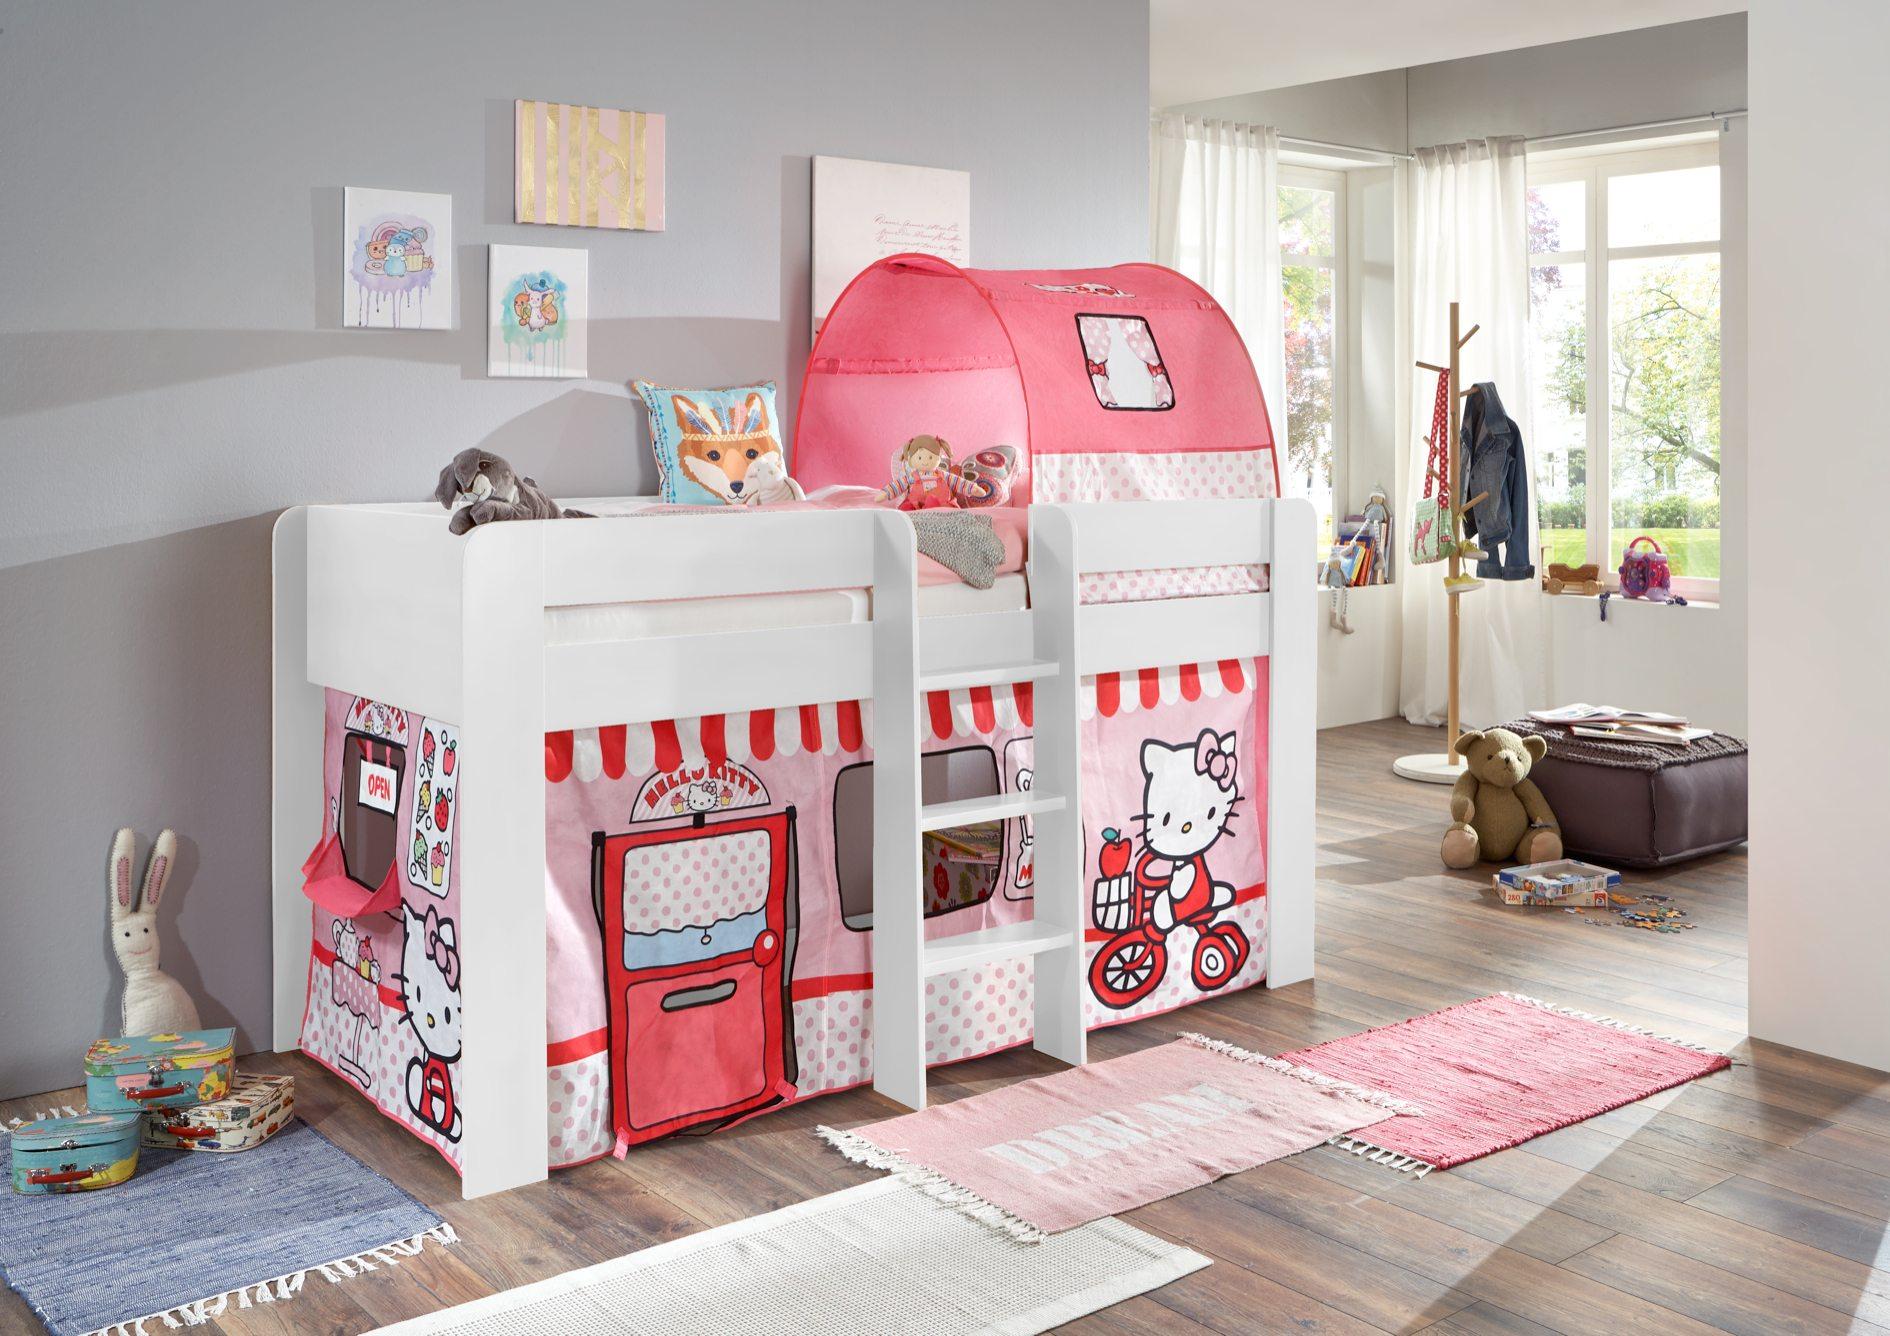 hochbett andi 1 kinderbett spielbett halbhohes bett wei kids teens betten hochbetten. Black Bedroom Furniture Sets. Home Design Ideas